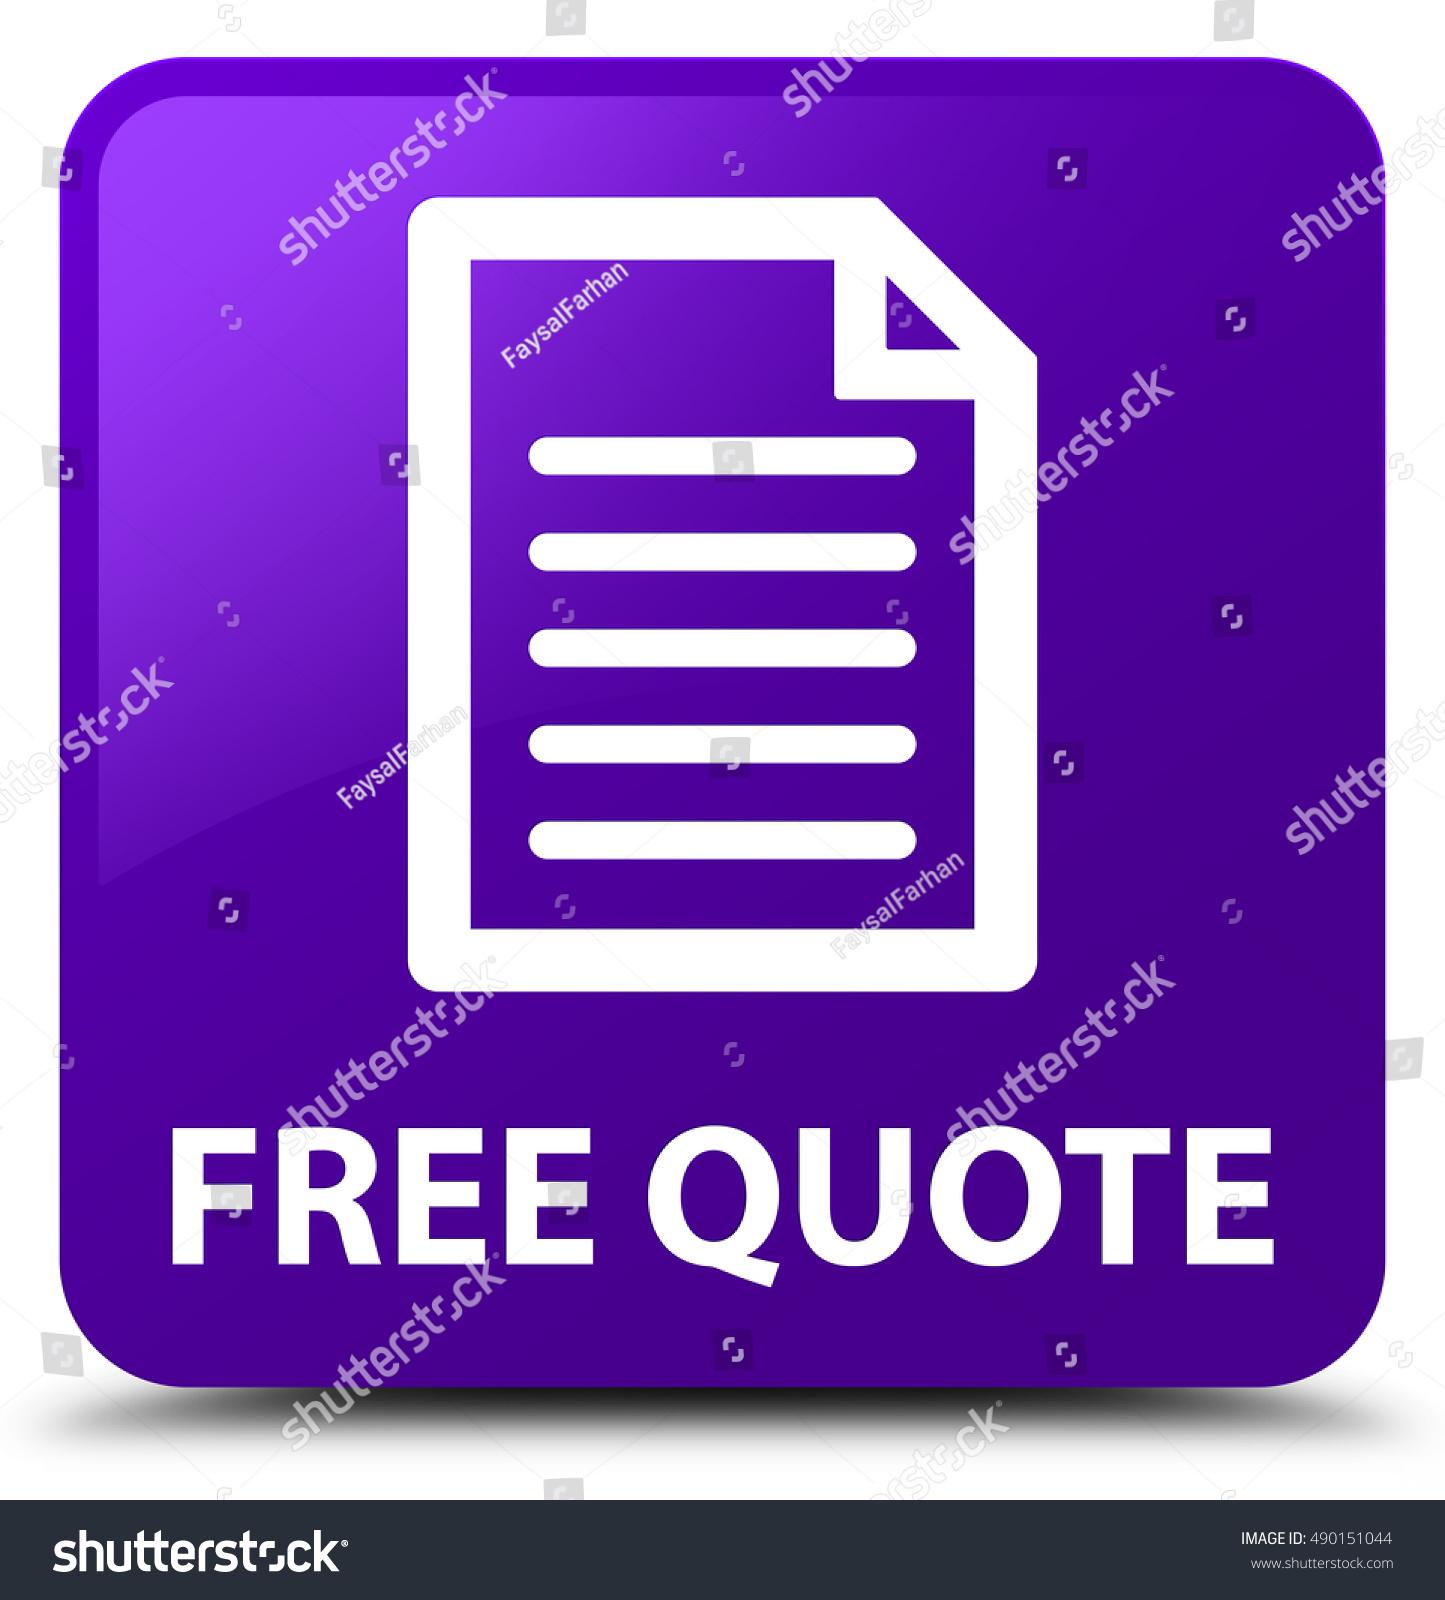 Free Qoute Free Quote Page Icon Purple Square Stock Illustration 490151044